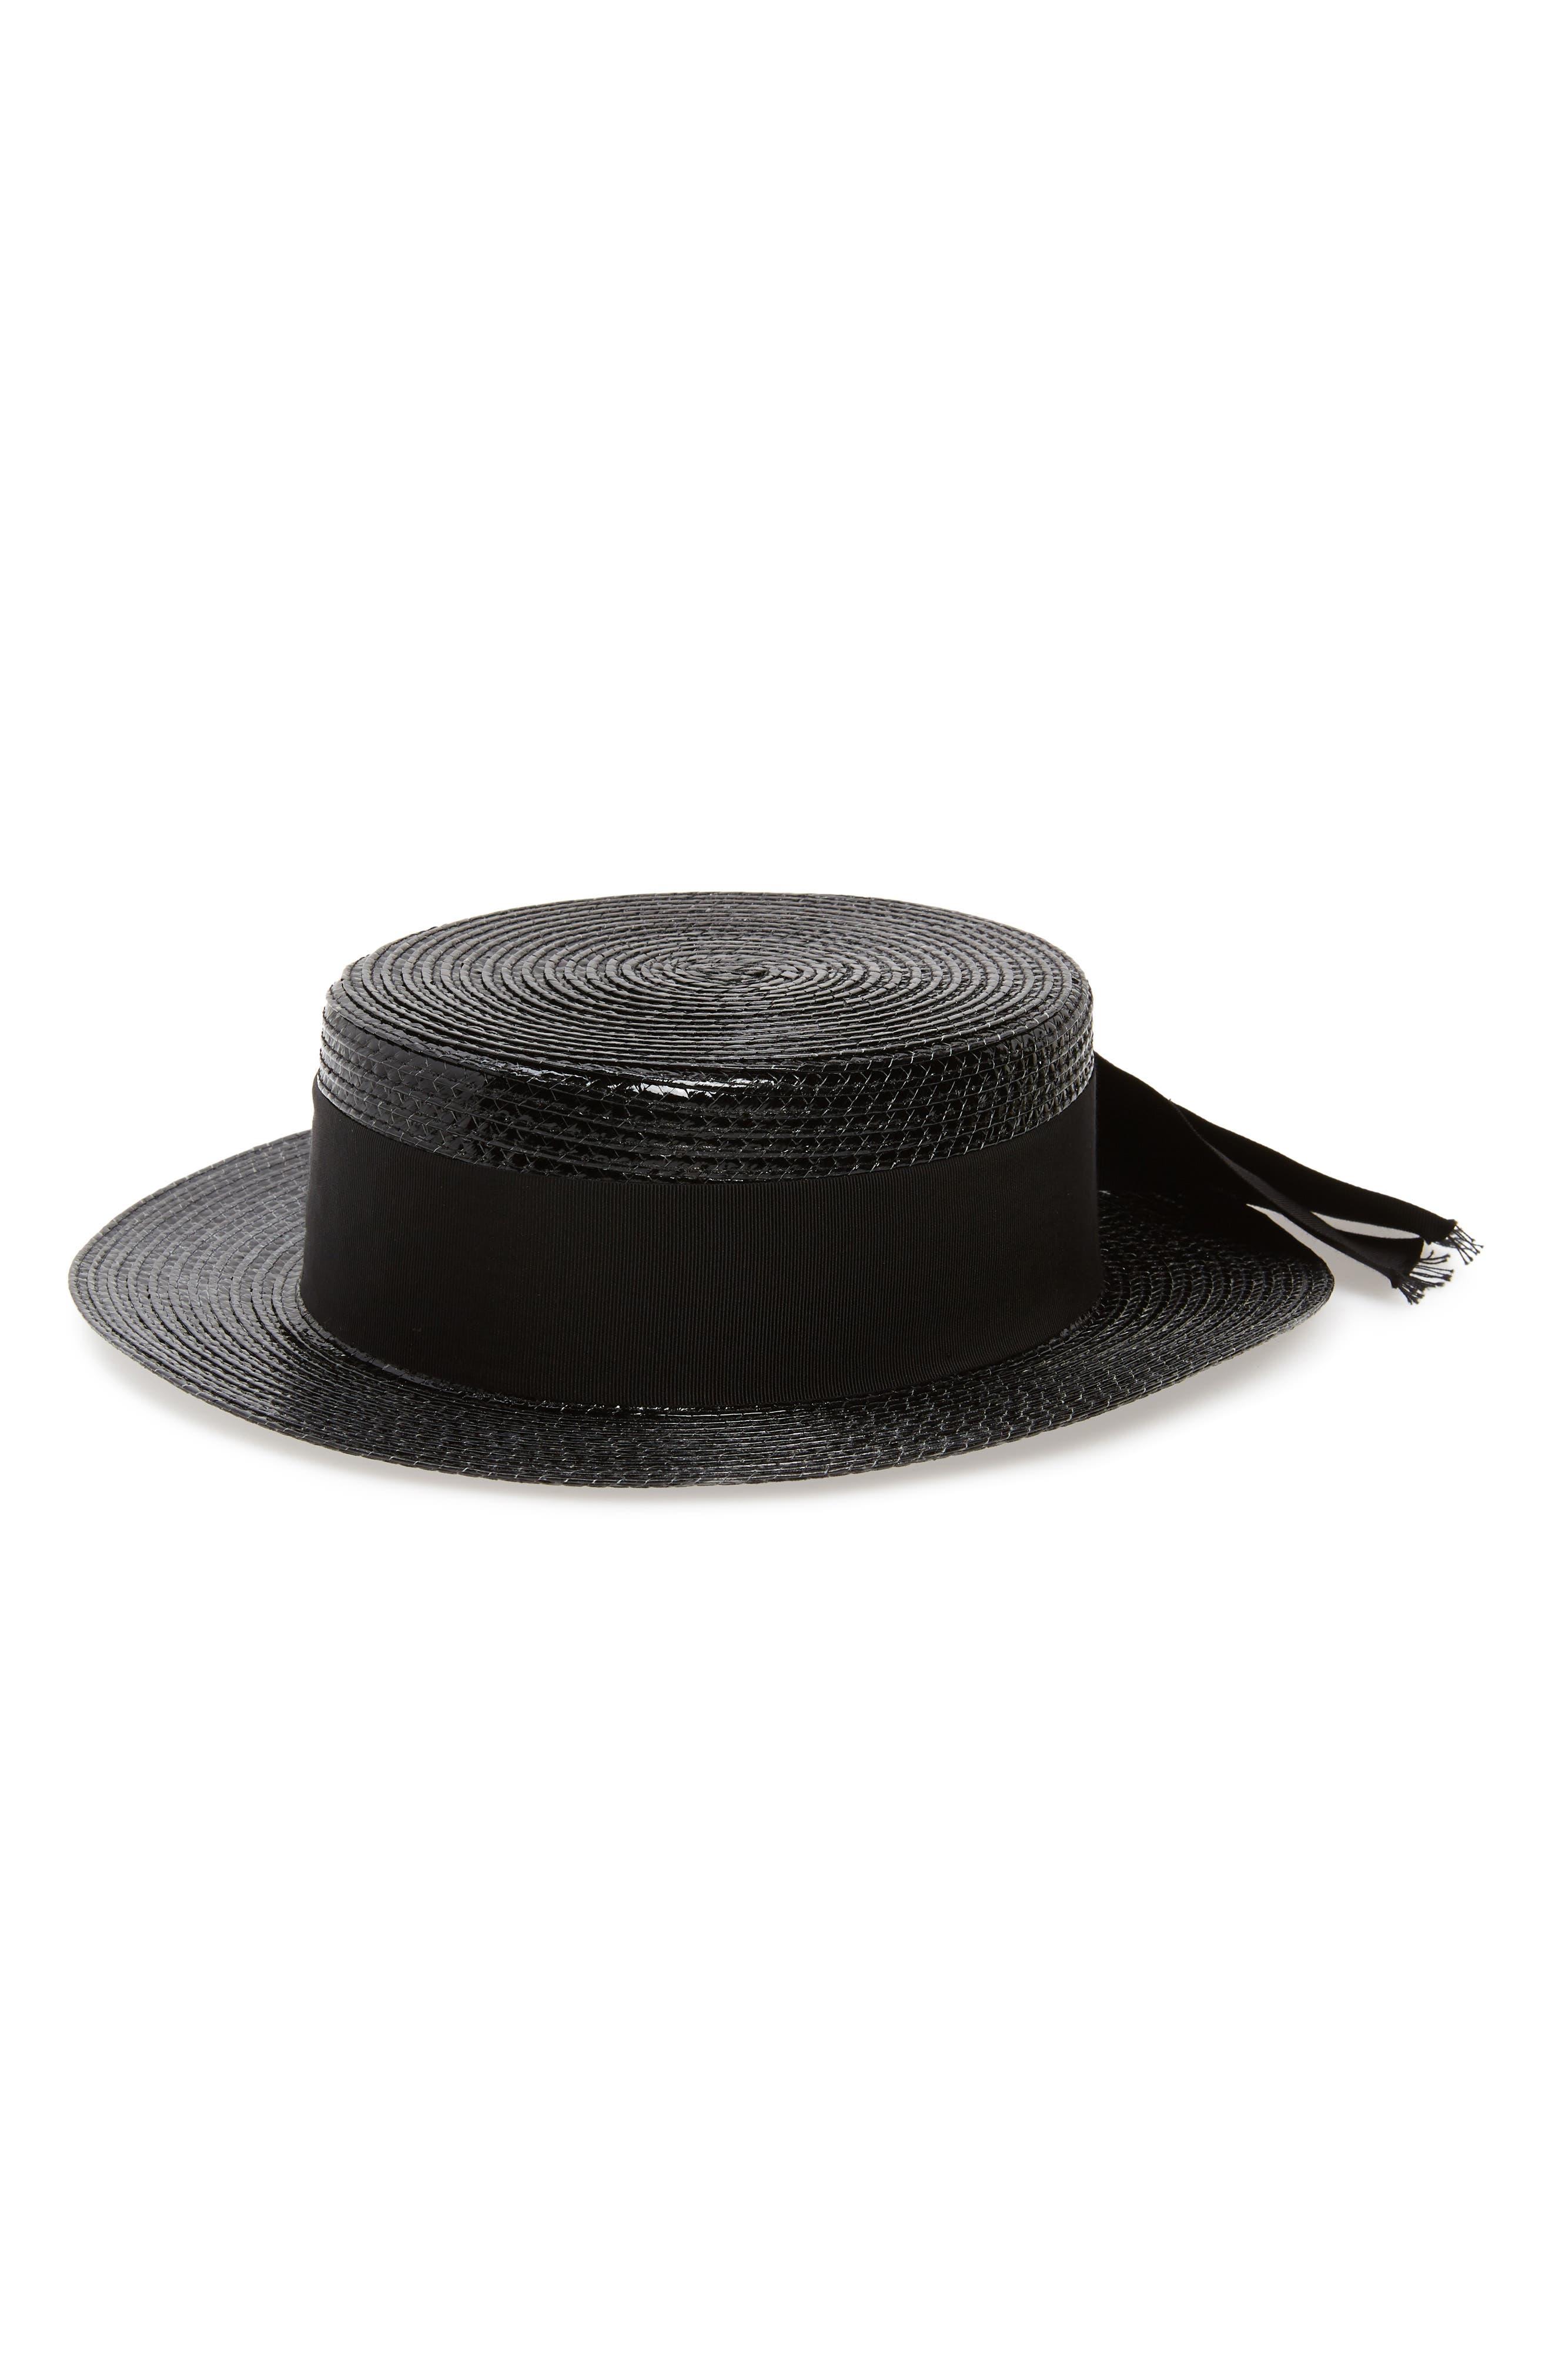 boater hat  b055b9d8924